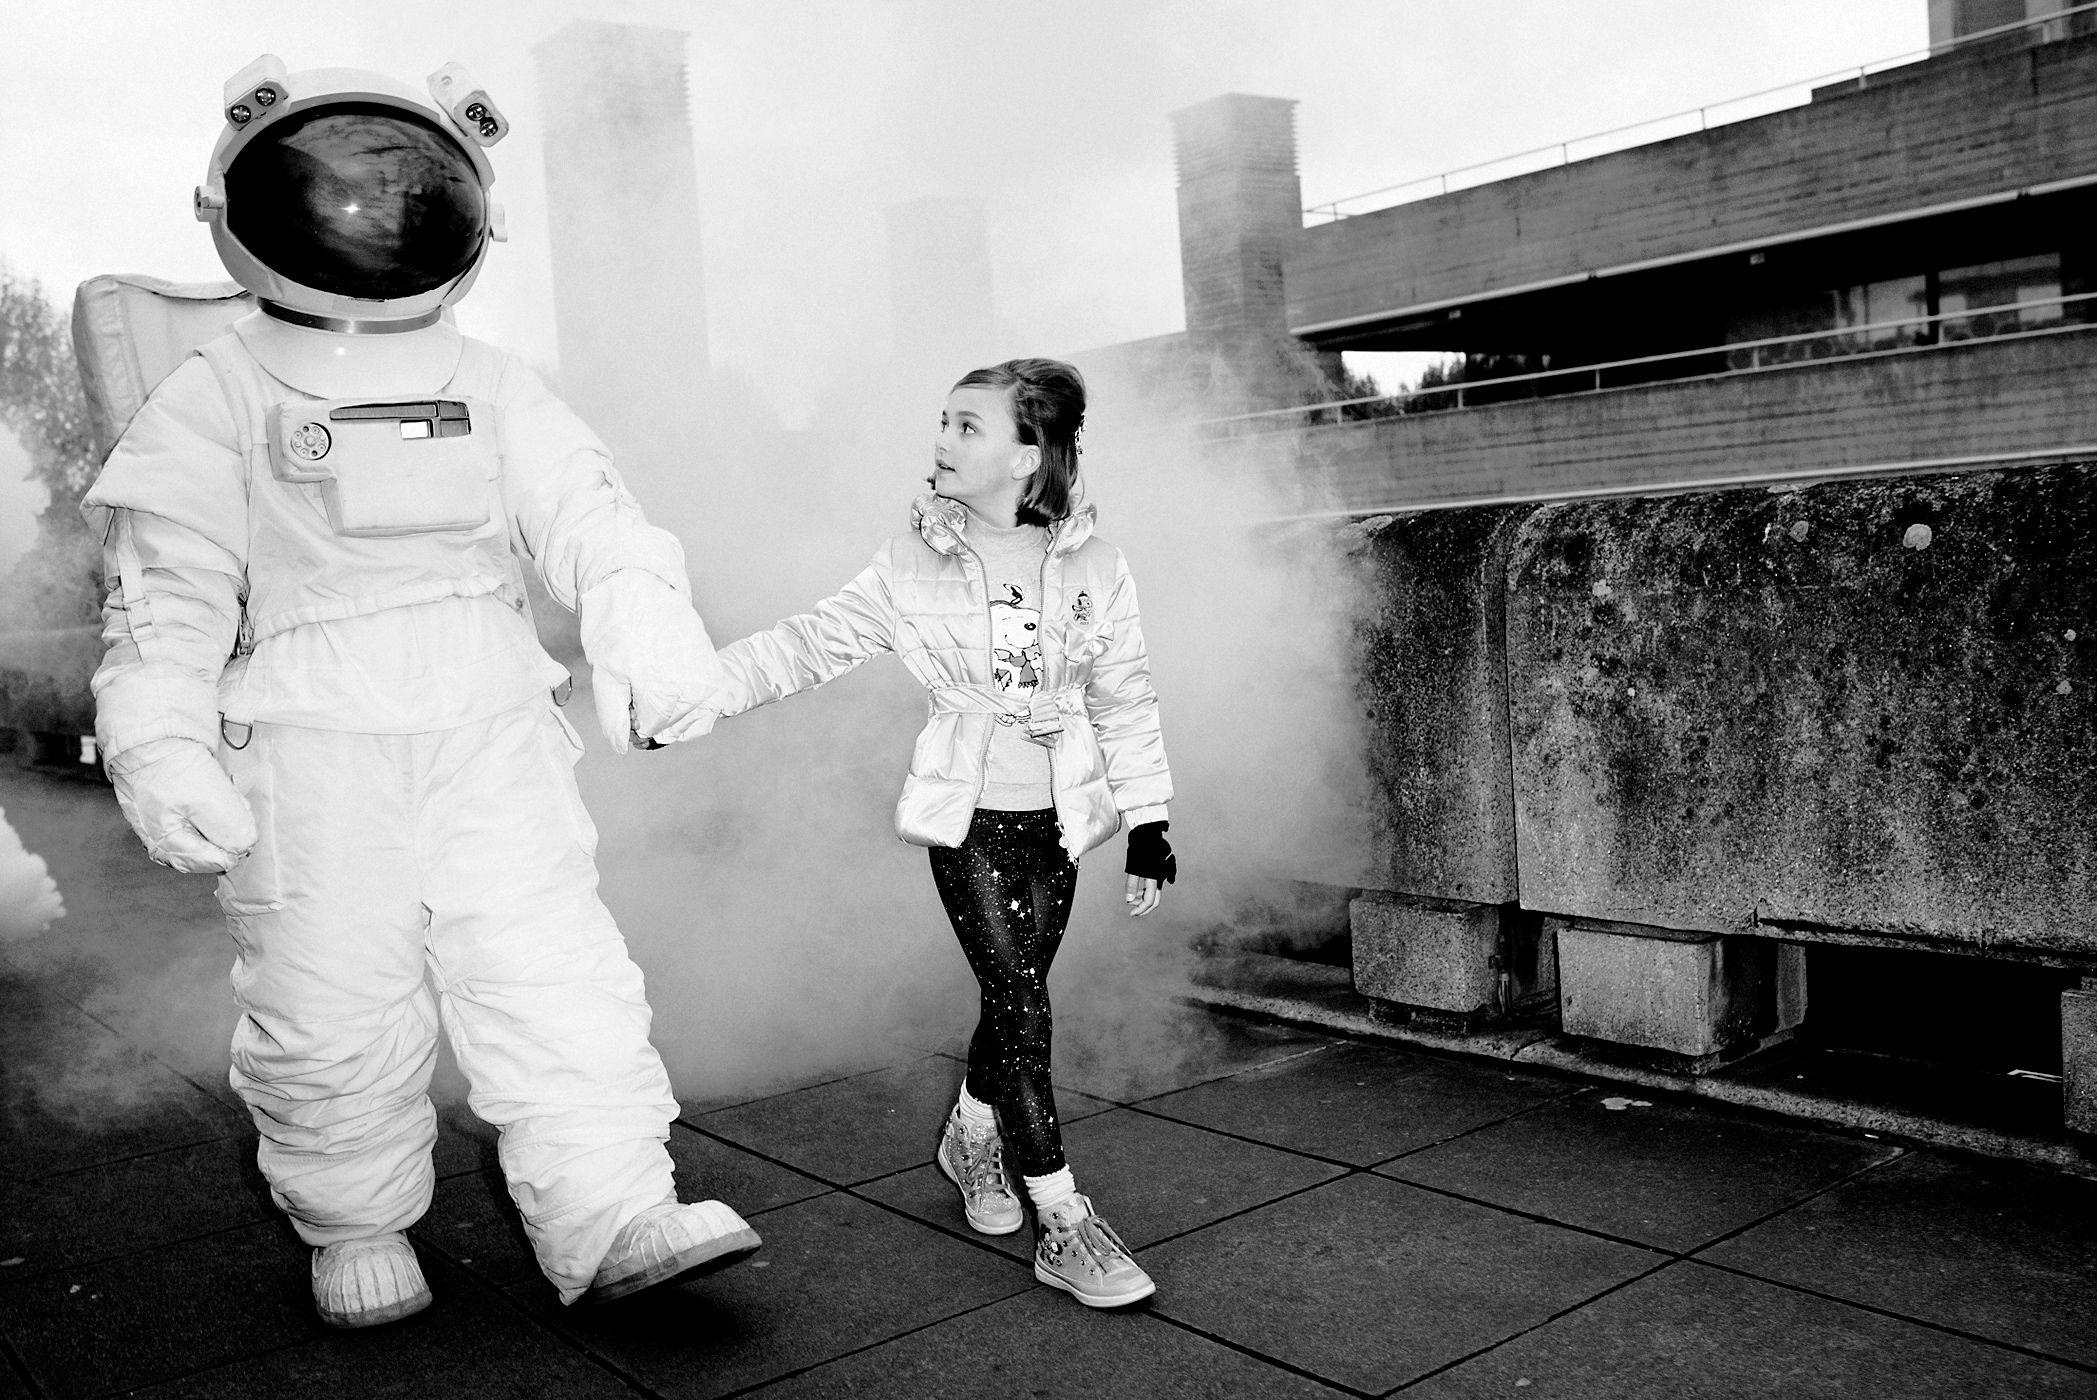 astronaut space fashion - photo #10